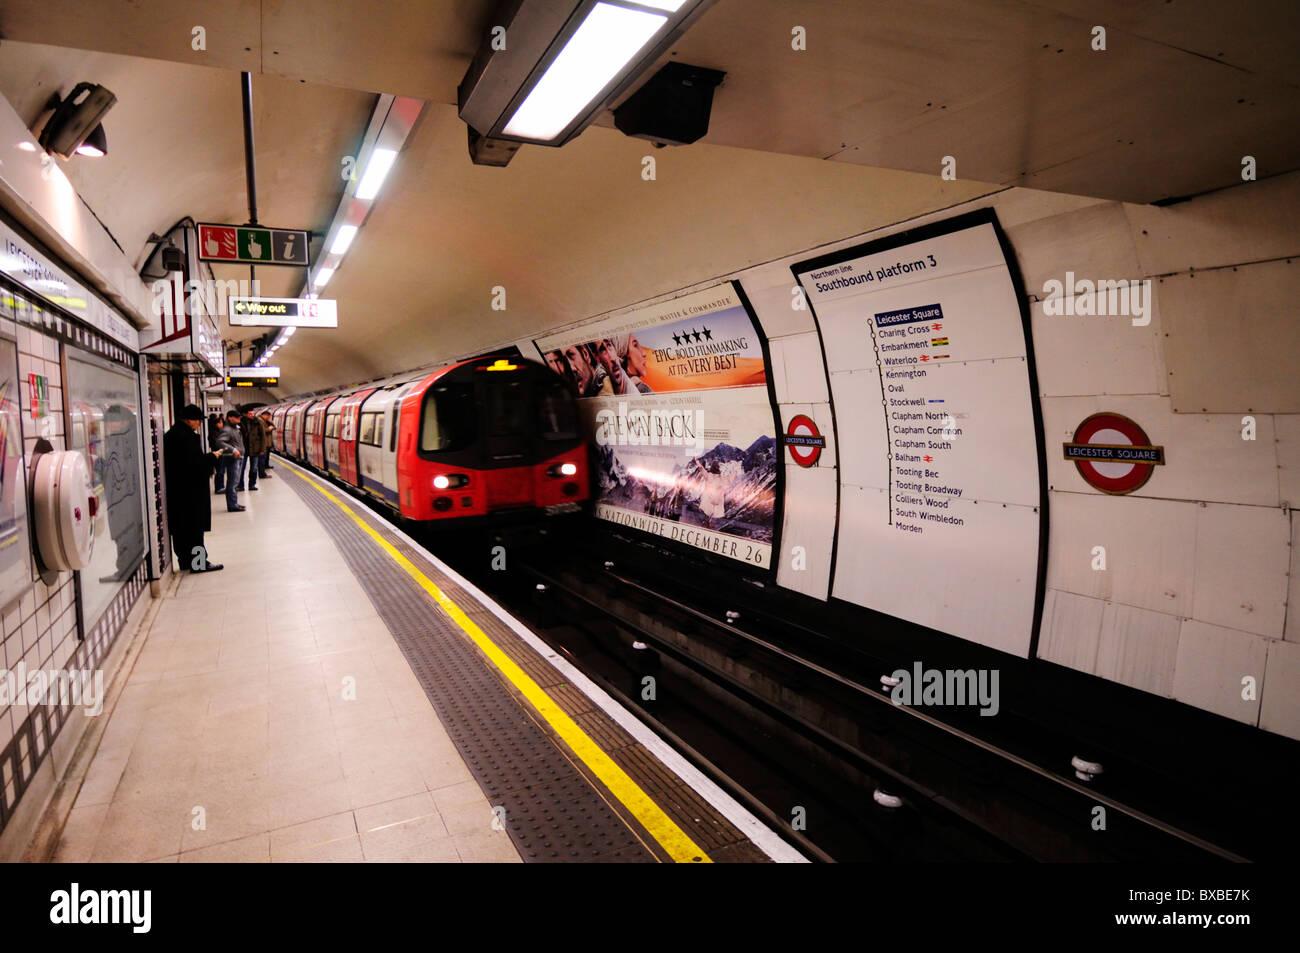 Leicester Square Underground Tube Station, Northern Line Platform, London, England, UK - Stock Image